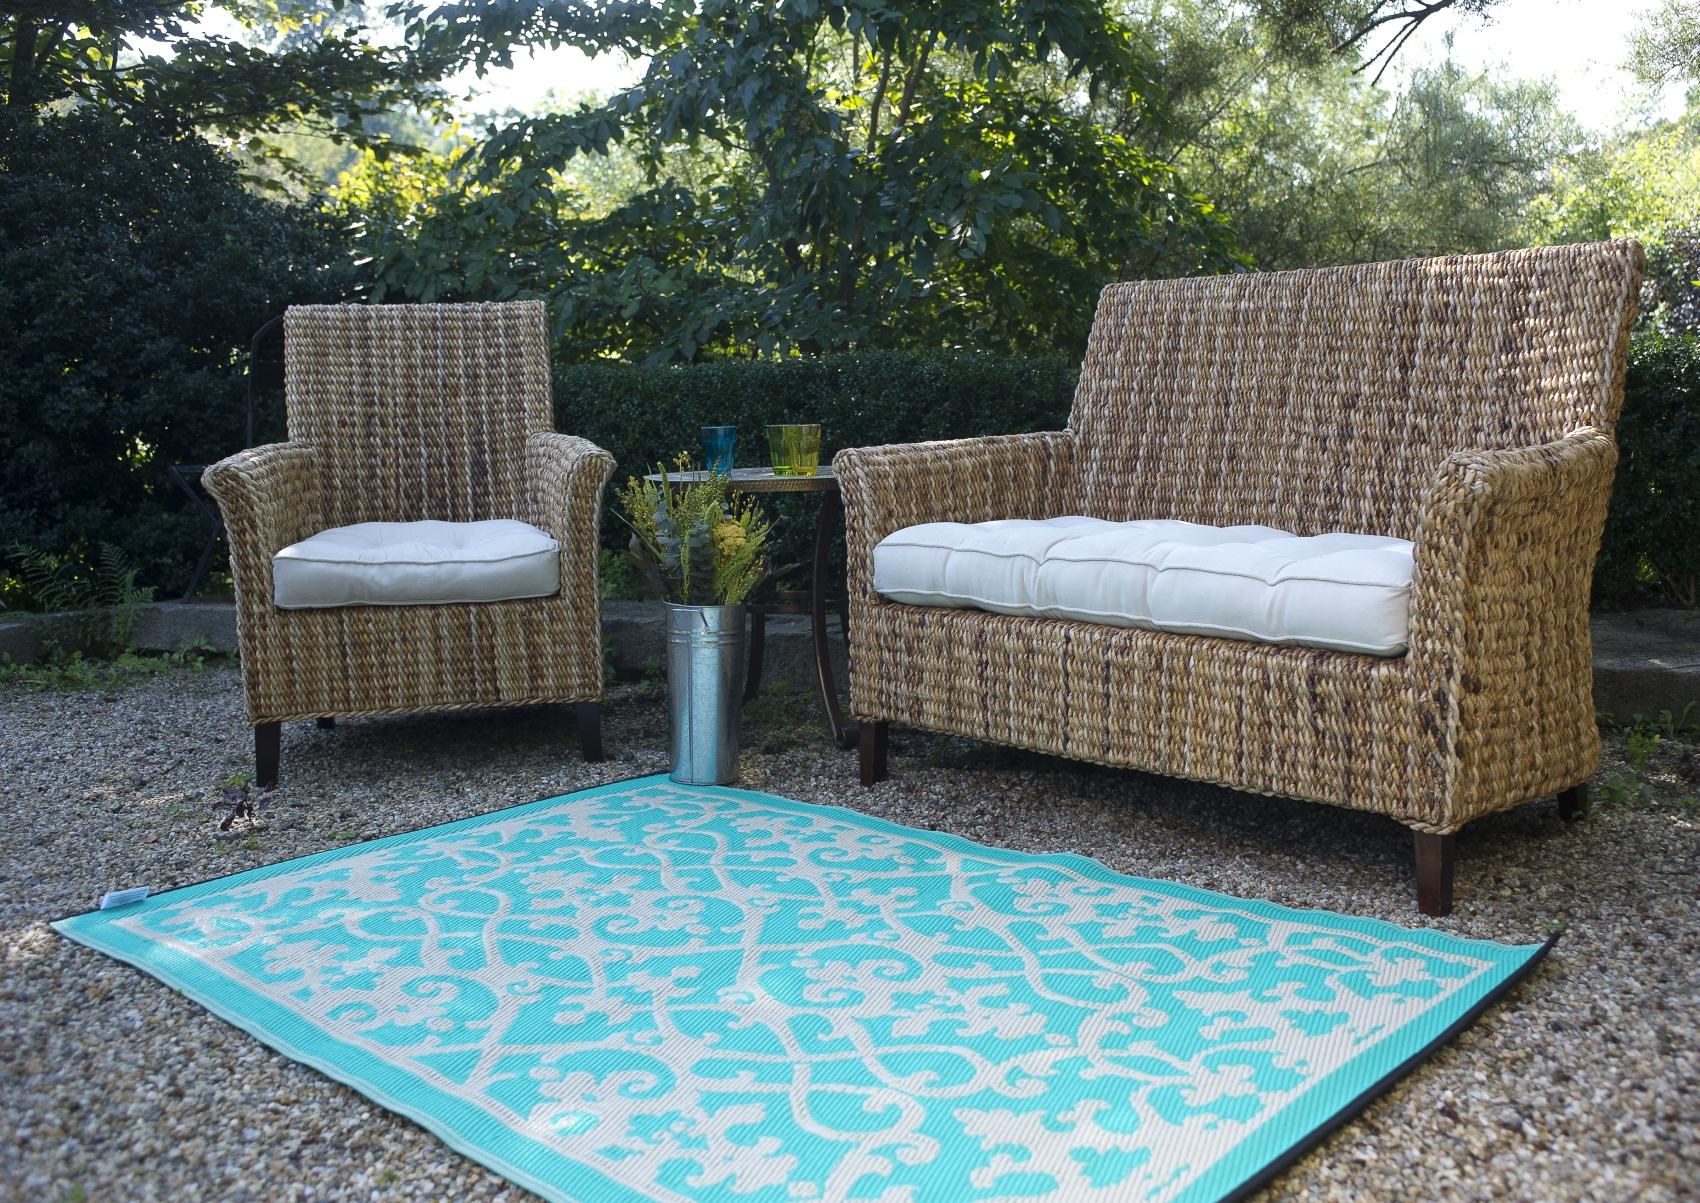 garten im quadrat outdoor teppich venedig ranken t rkis hellgr n cremewei. Black Bedroom Furniture Sets. Home Design Ideas